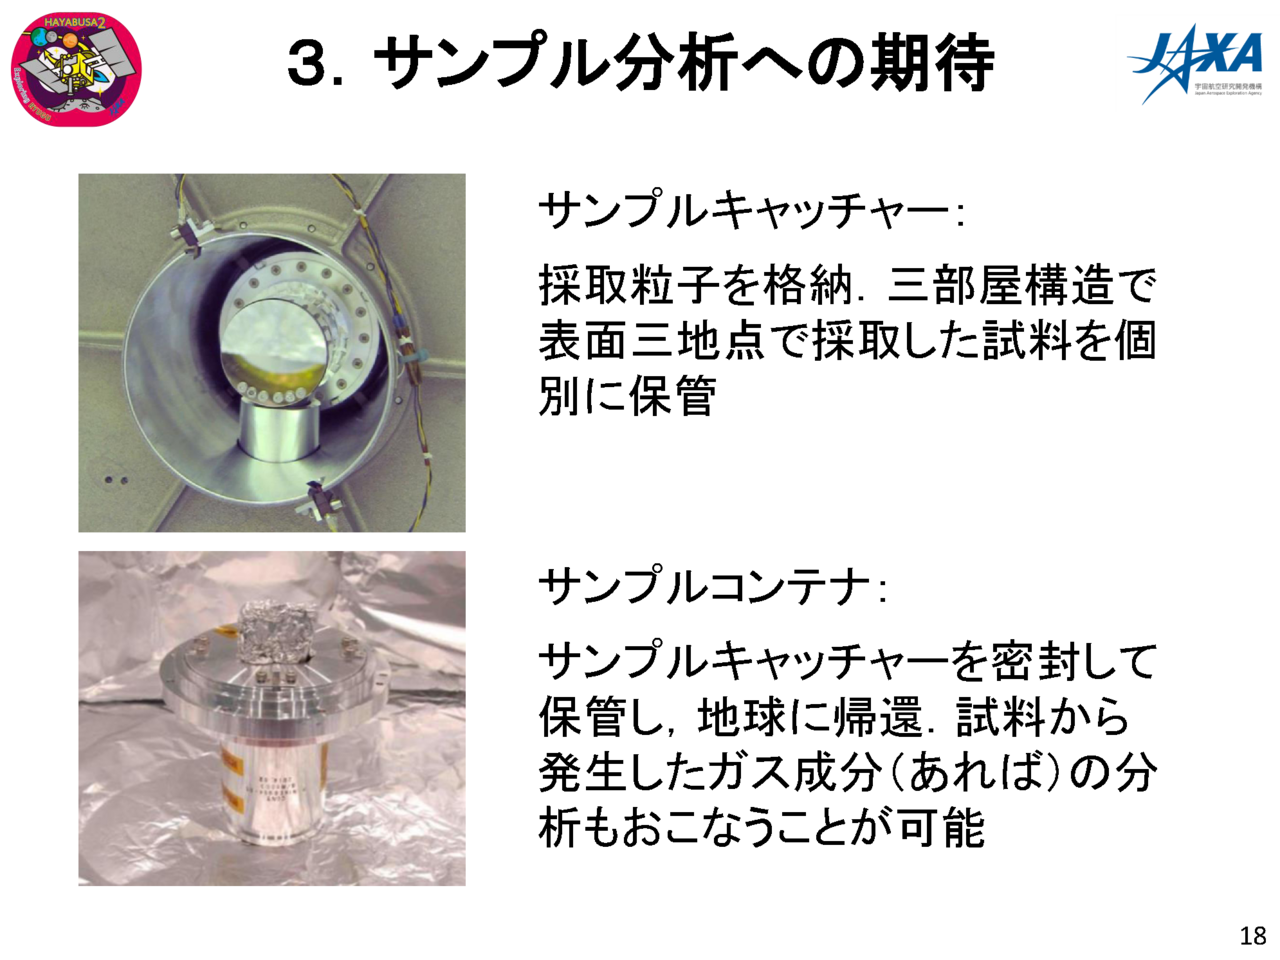 f:id:Imamura:20180719131713p:plain